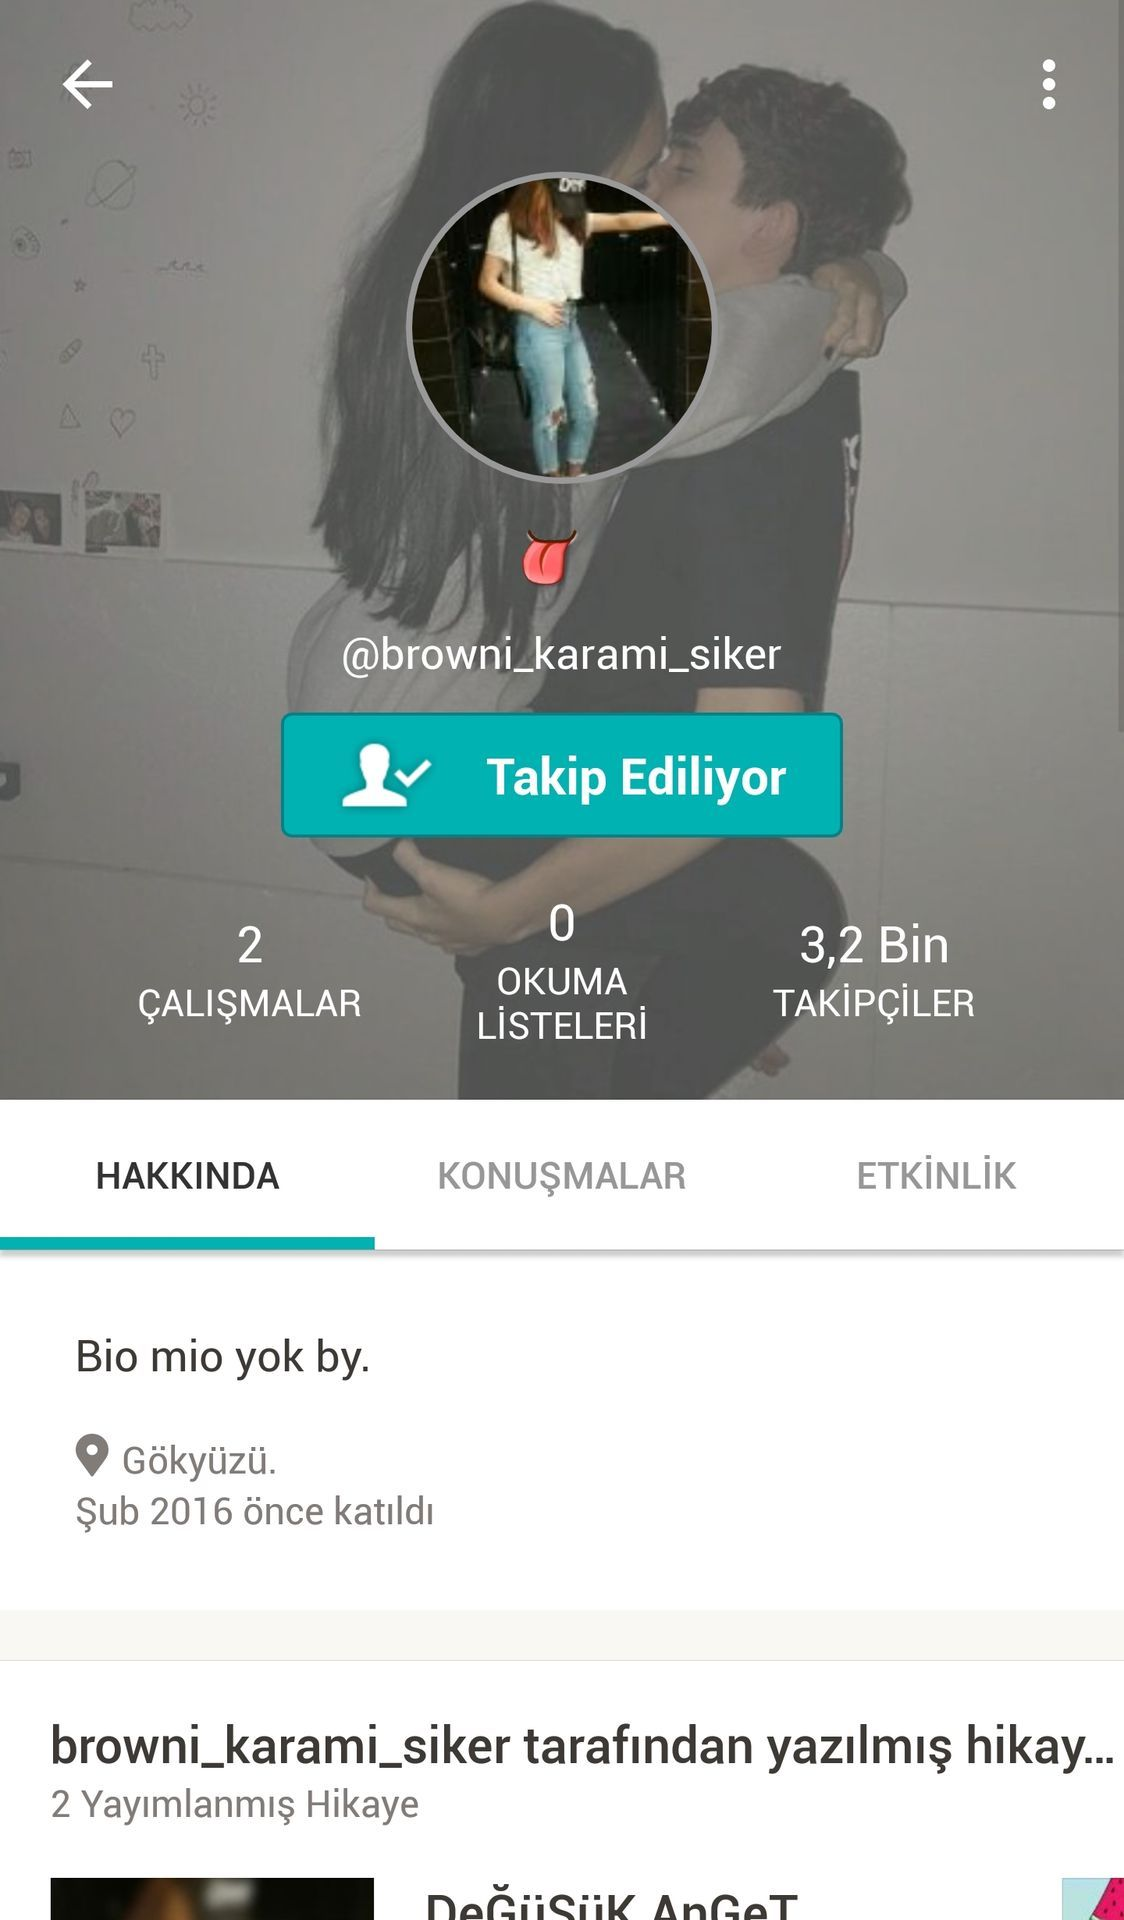 browni_karami_siker